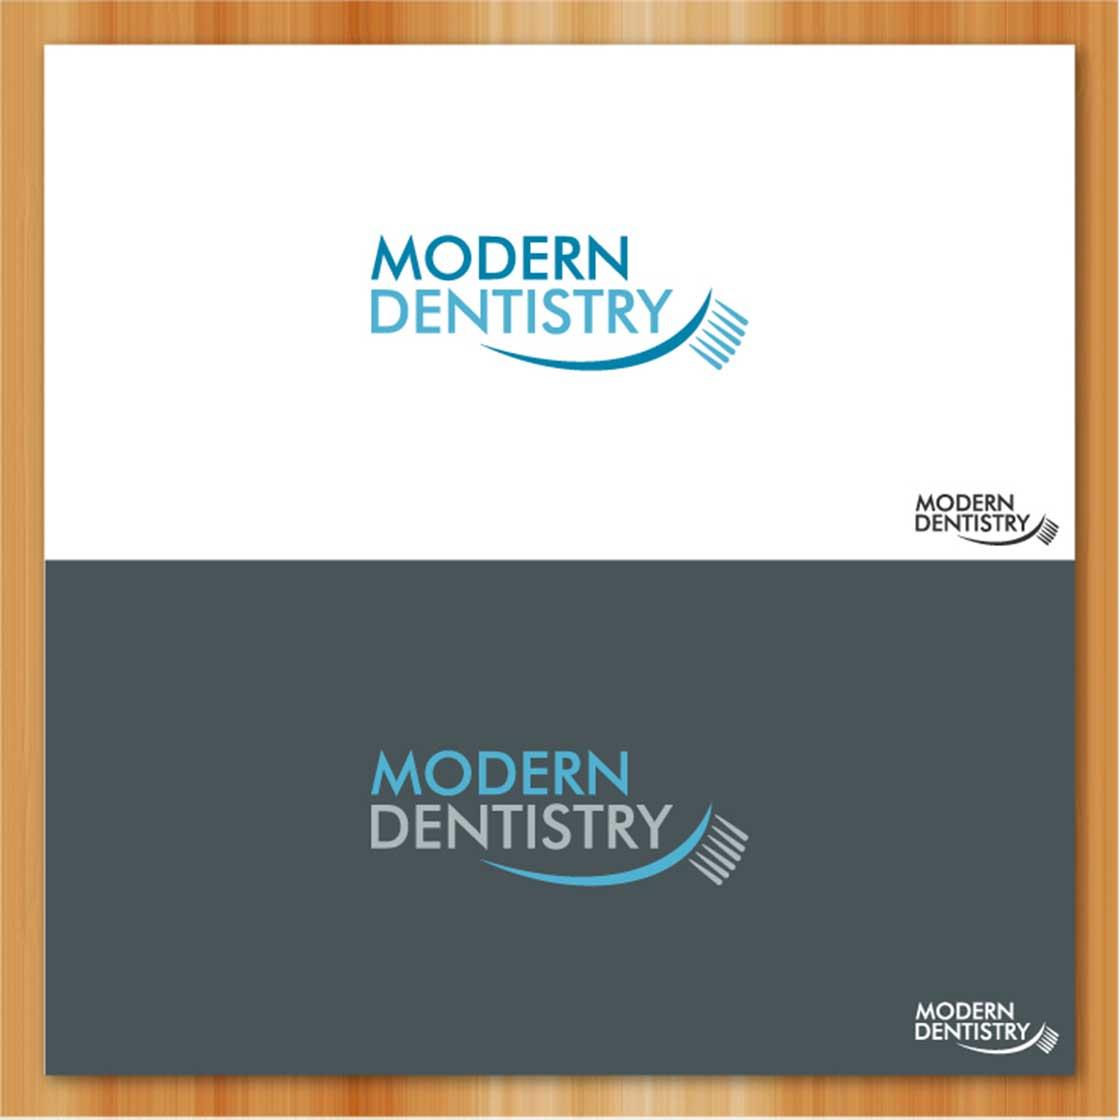 crowdspring dental logo design by DesignsDynamic